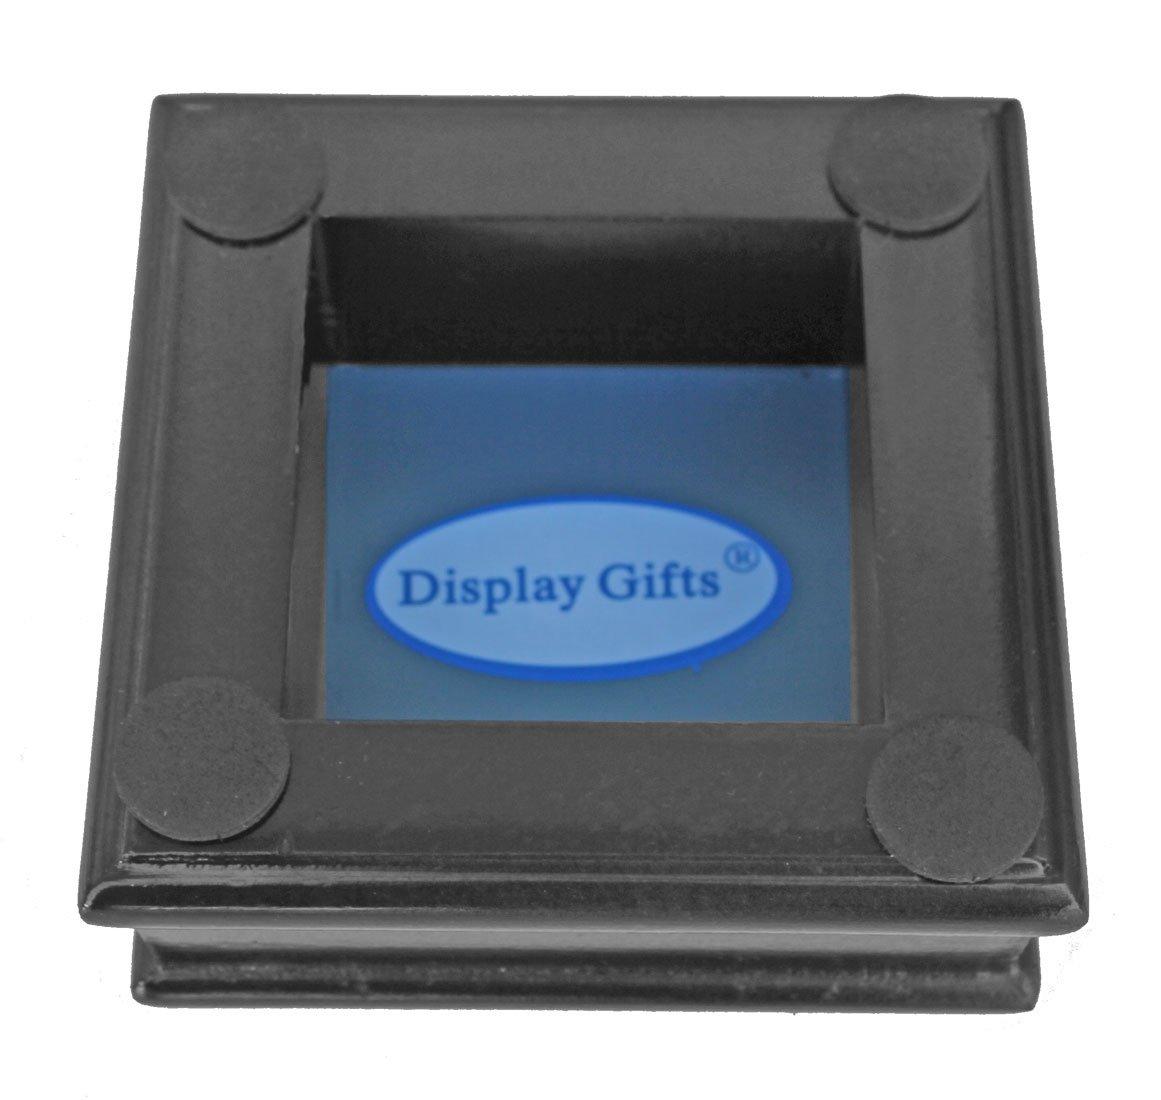 DisplayGifts Pro UV Baseball Display Case Holder Stand (Black)